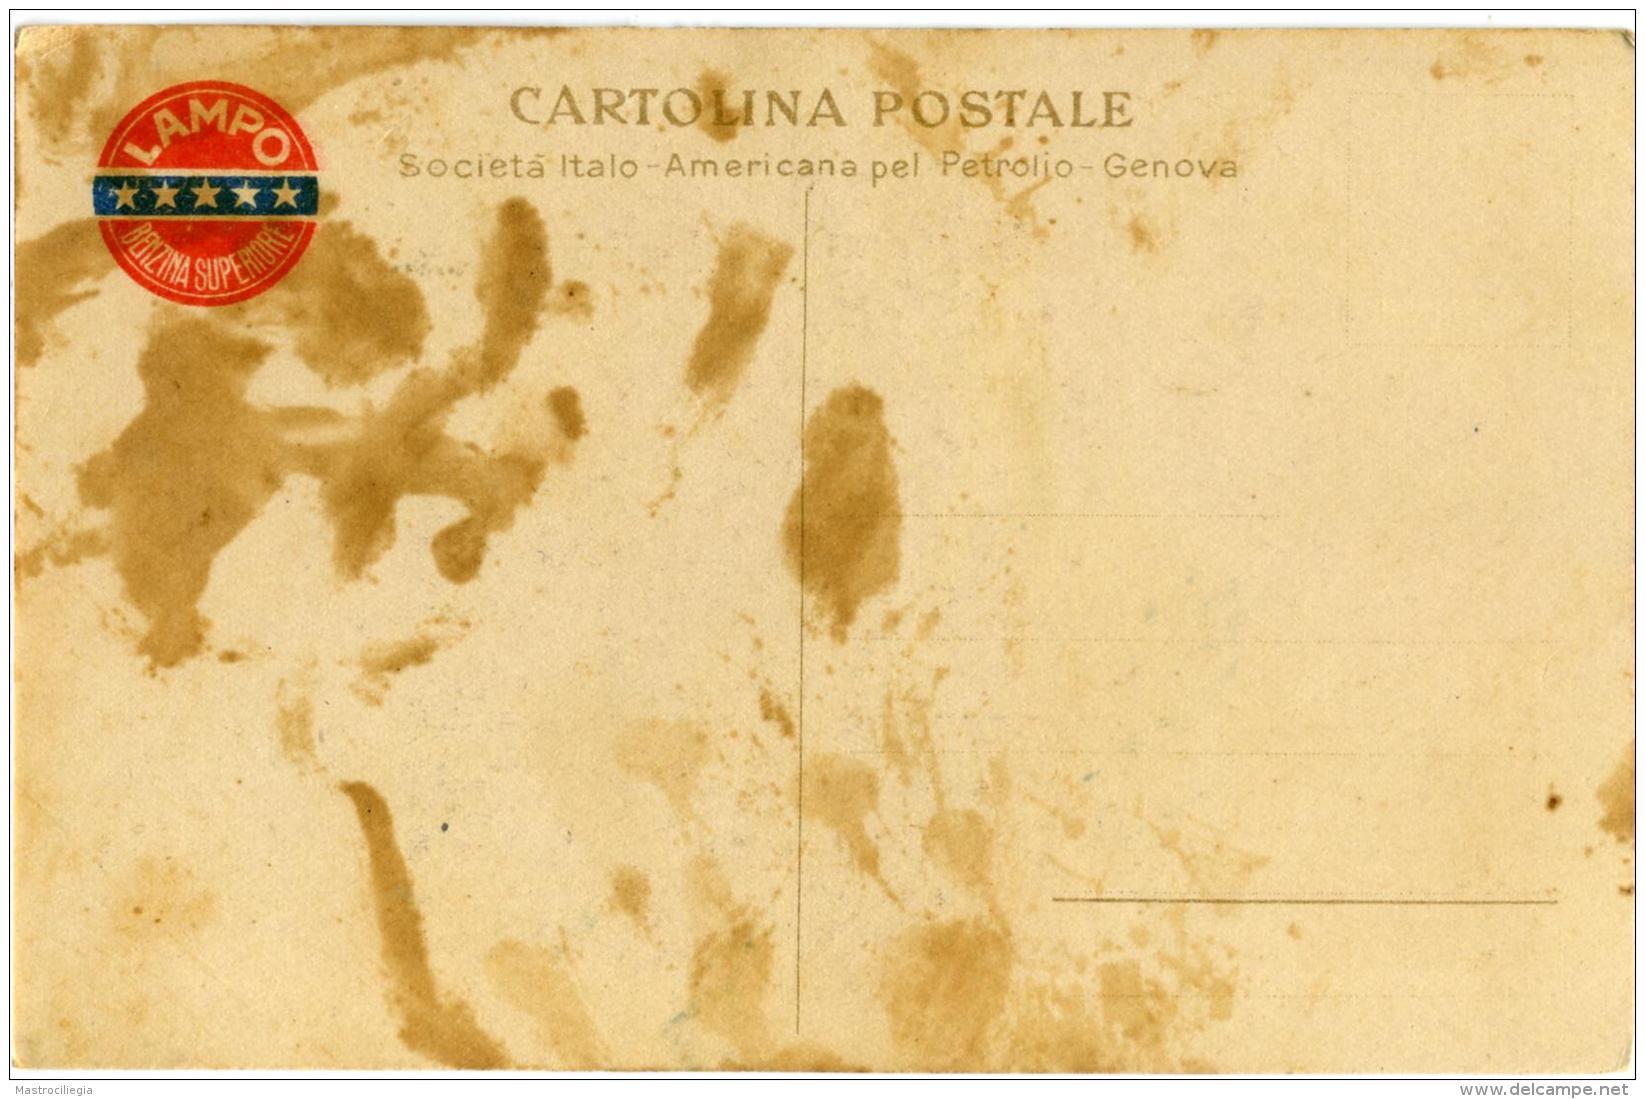 COW BOY  HORSE  Pubblicitaria Lampo  Benzina Superiore - Cavalli